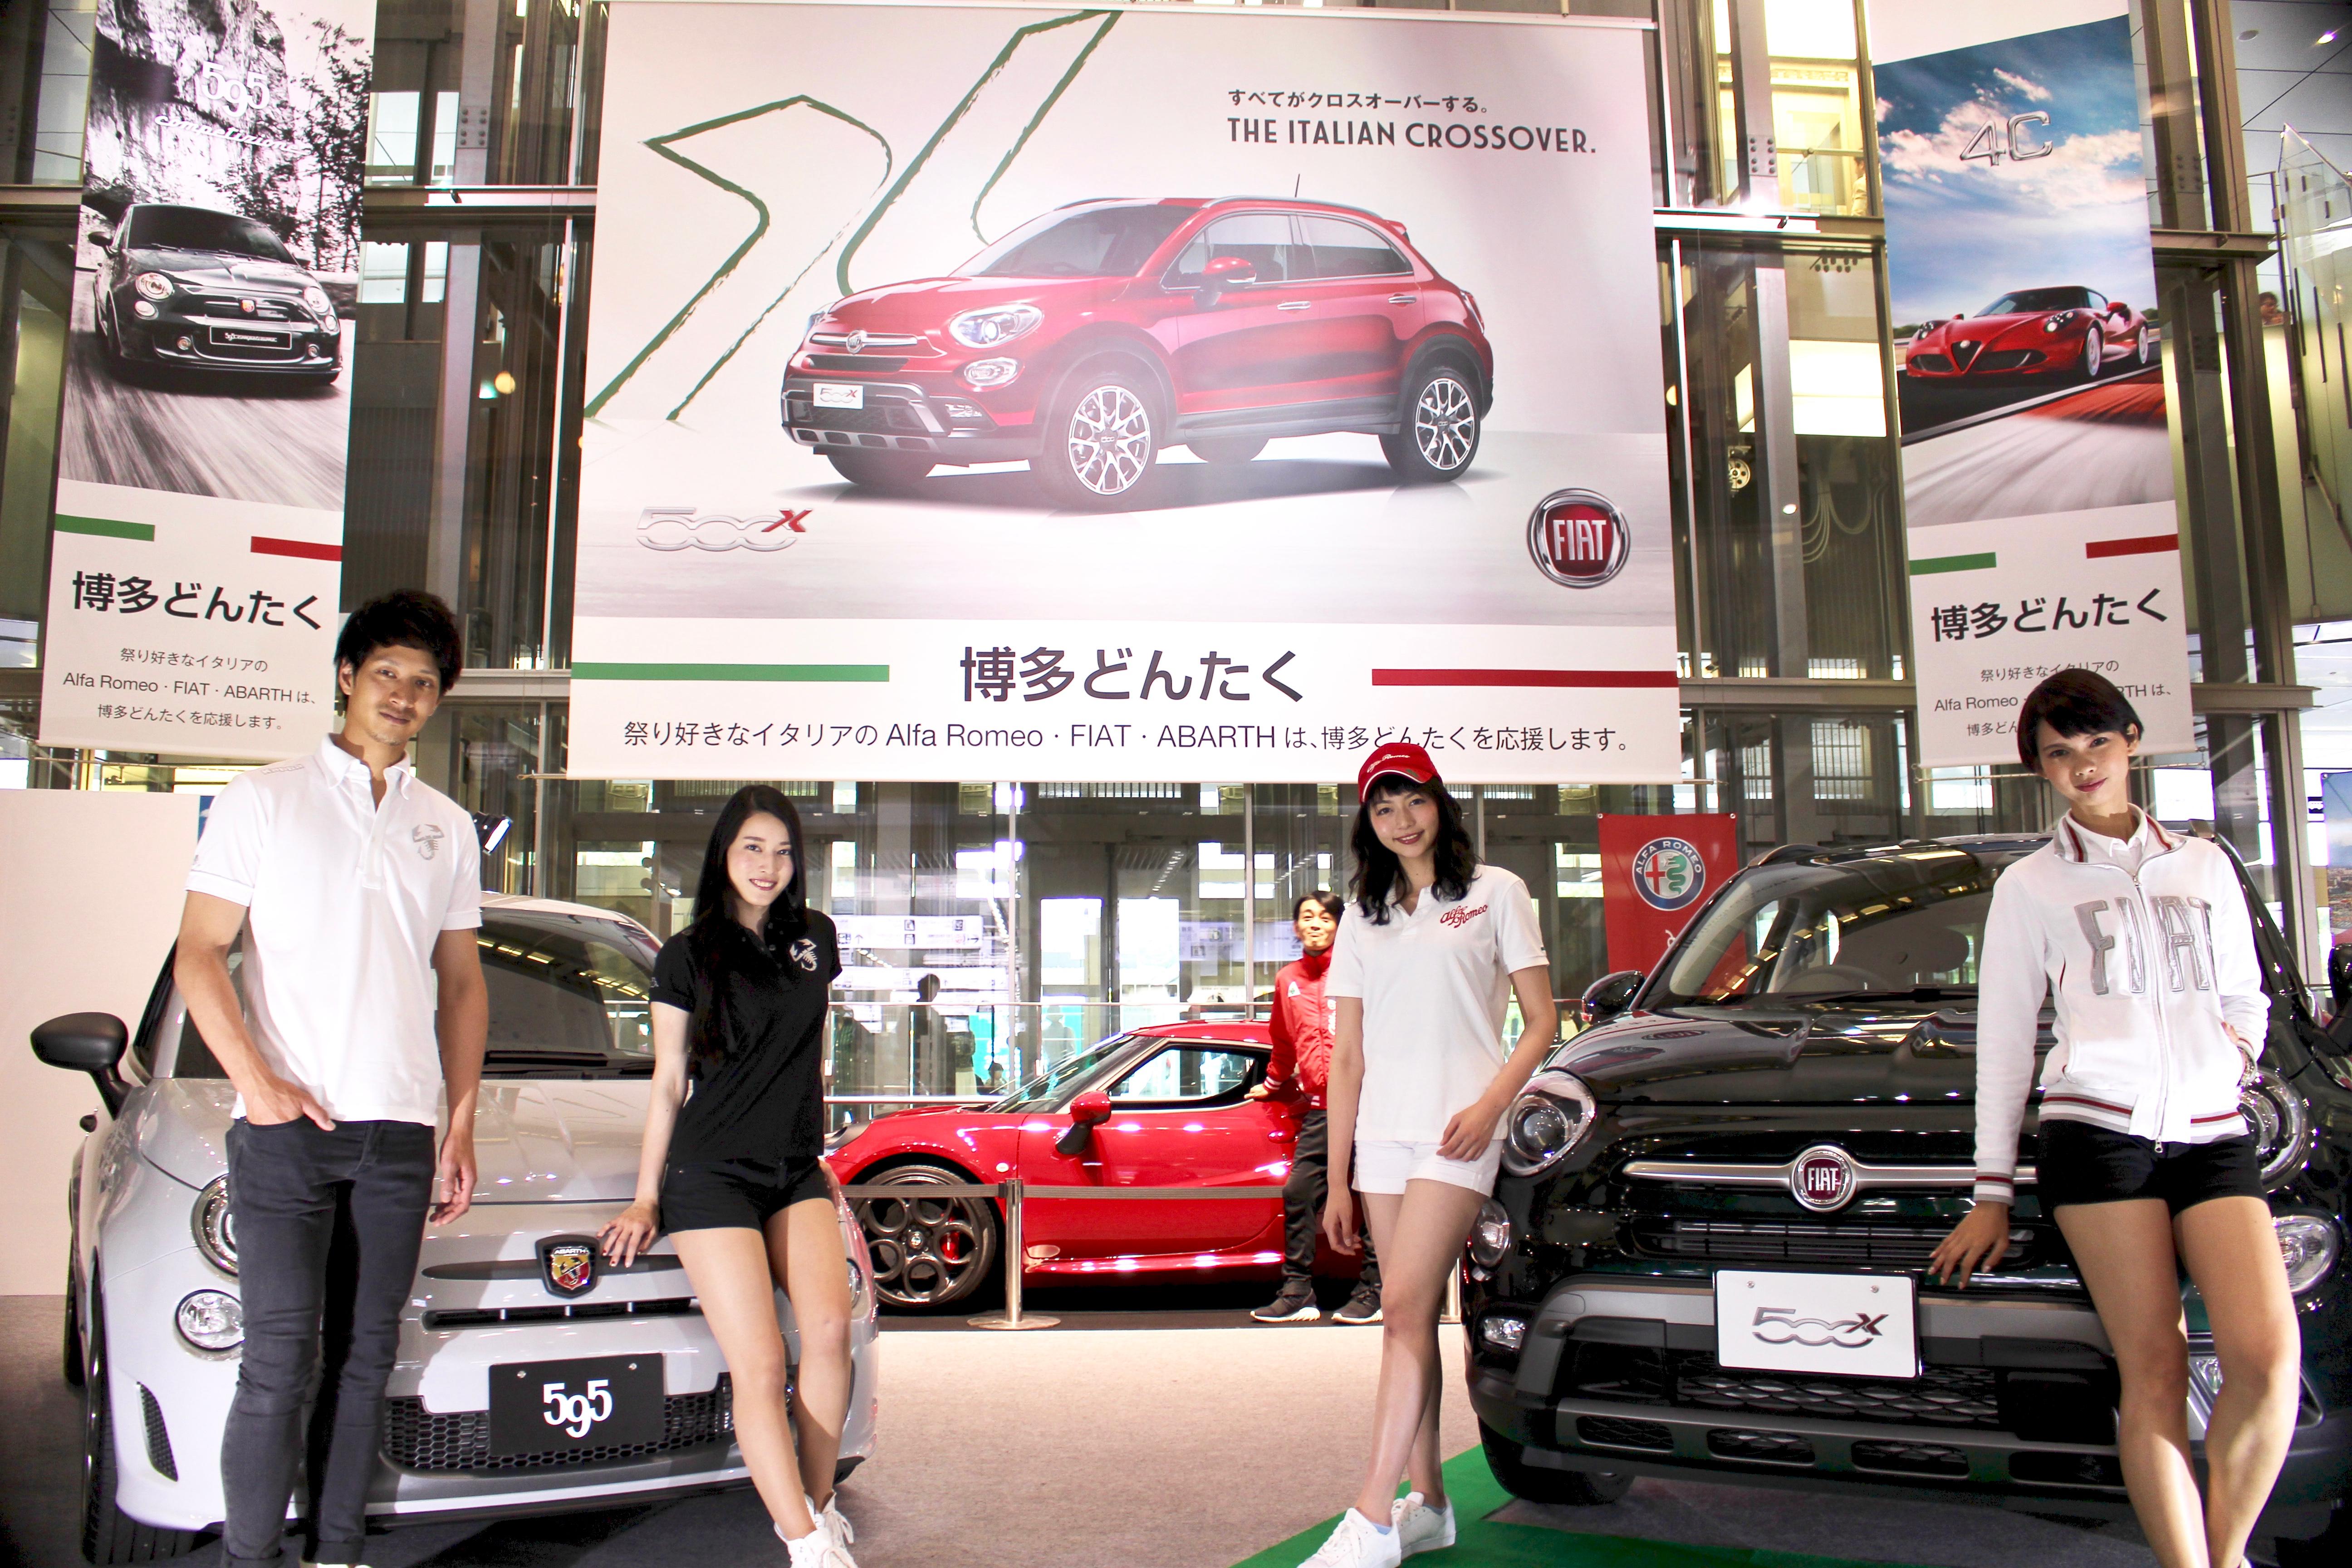 Alfa Romeo/FIAT/ABARTH 博多駅ジャック 2016